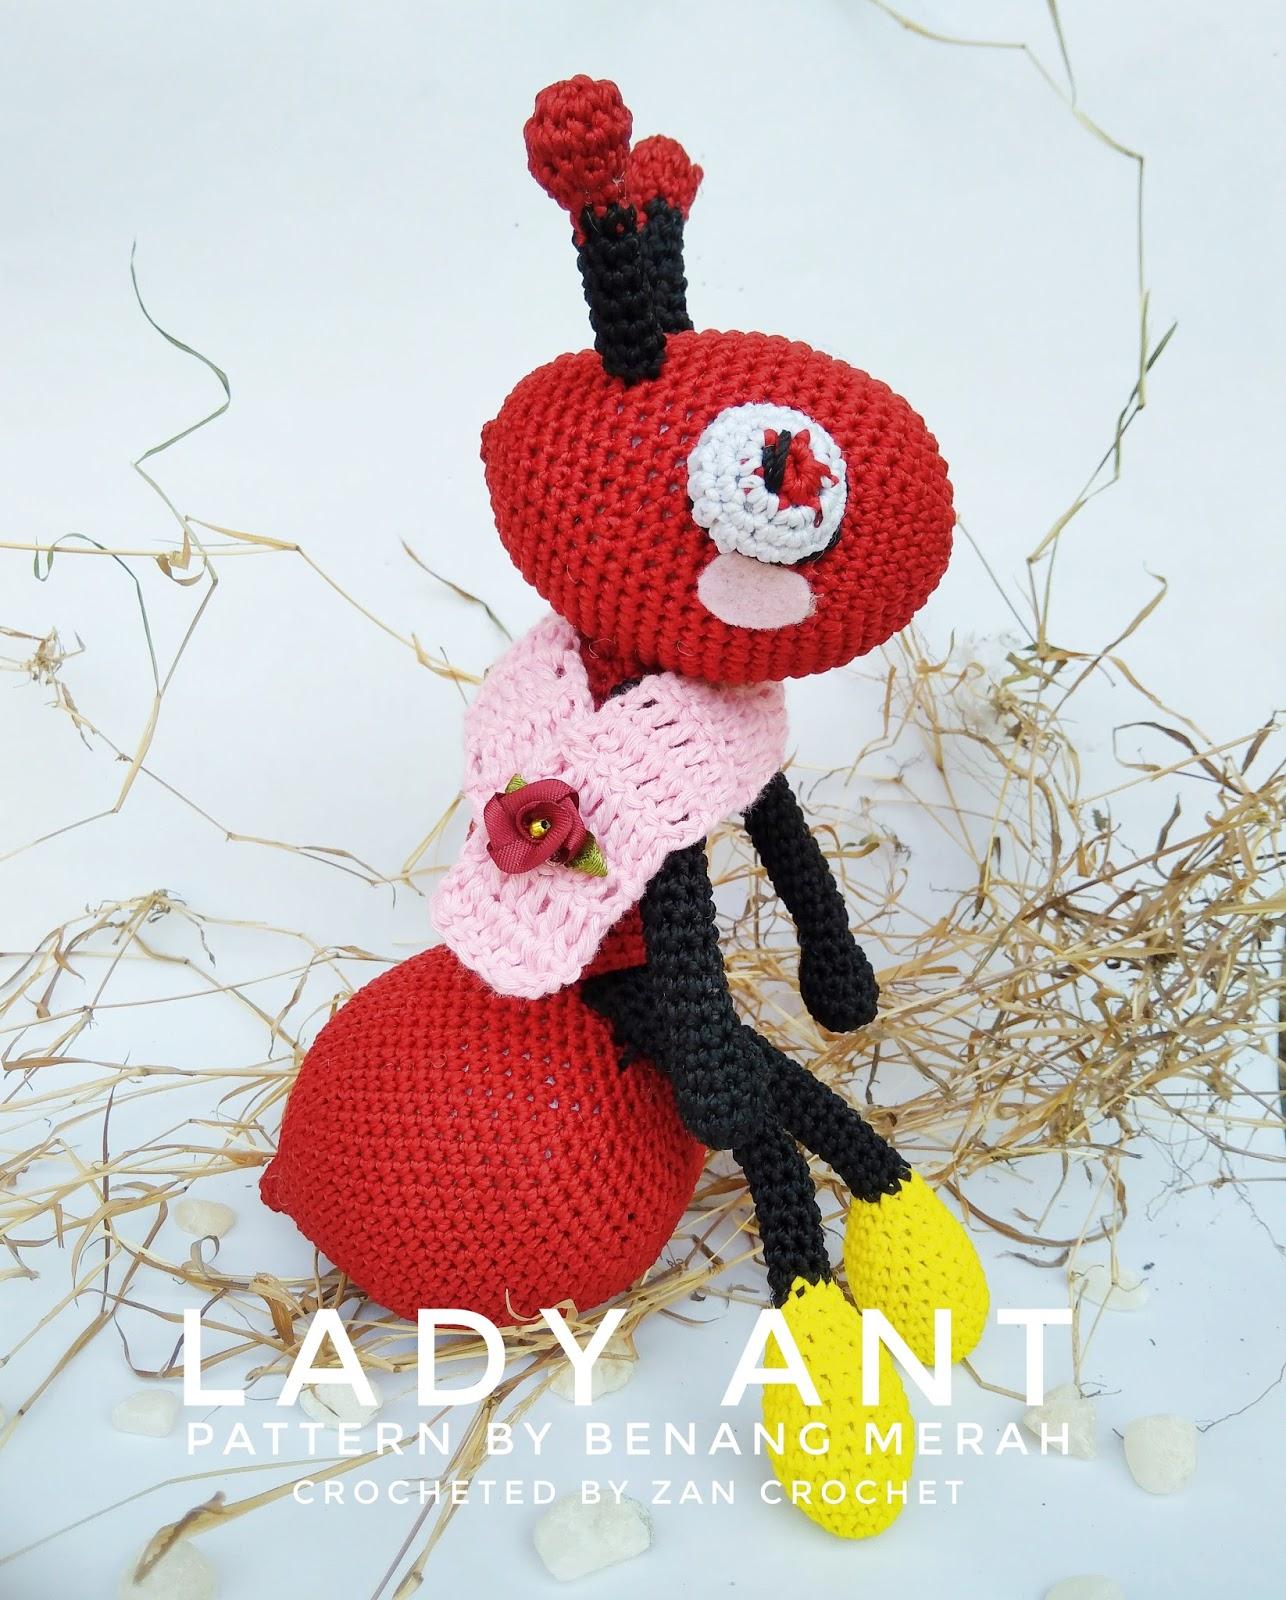 Lady Ant ~ Zan Crochet